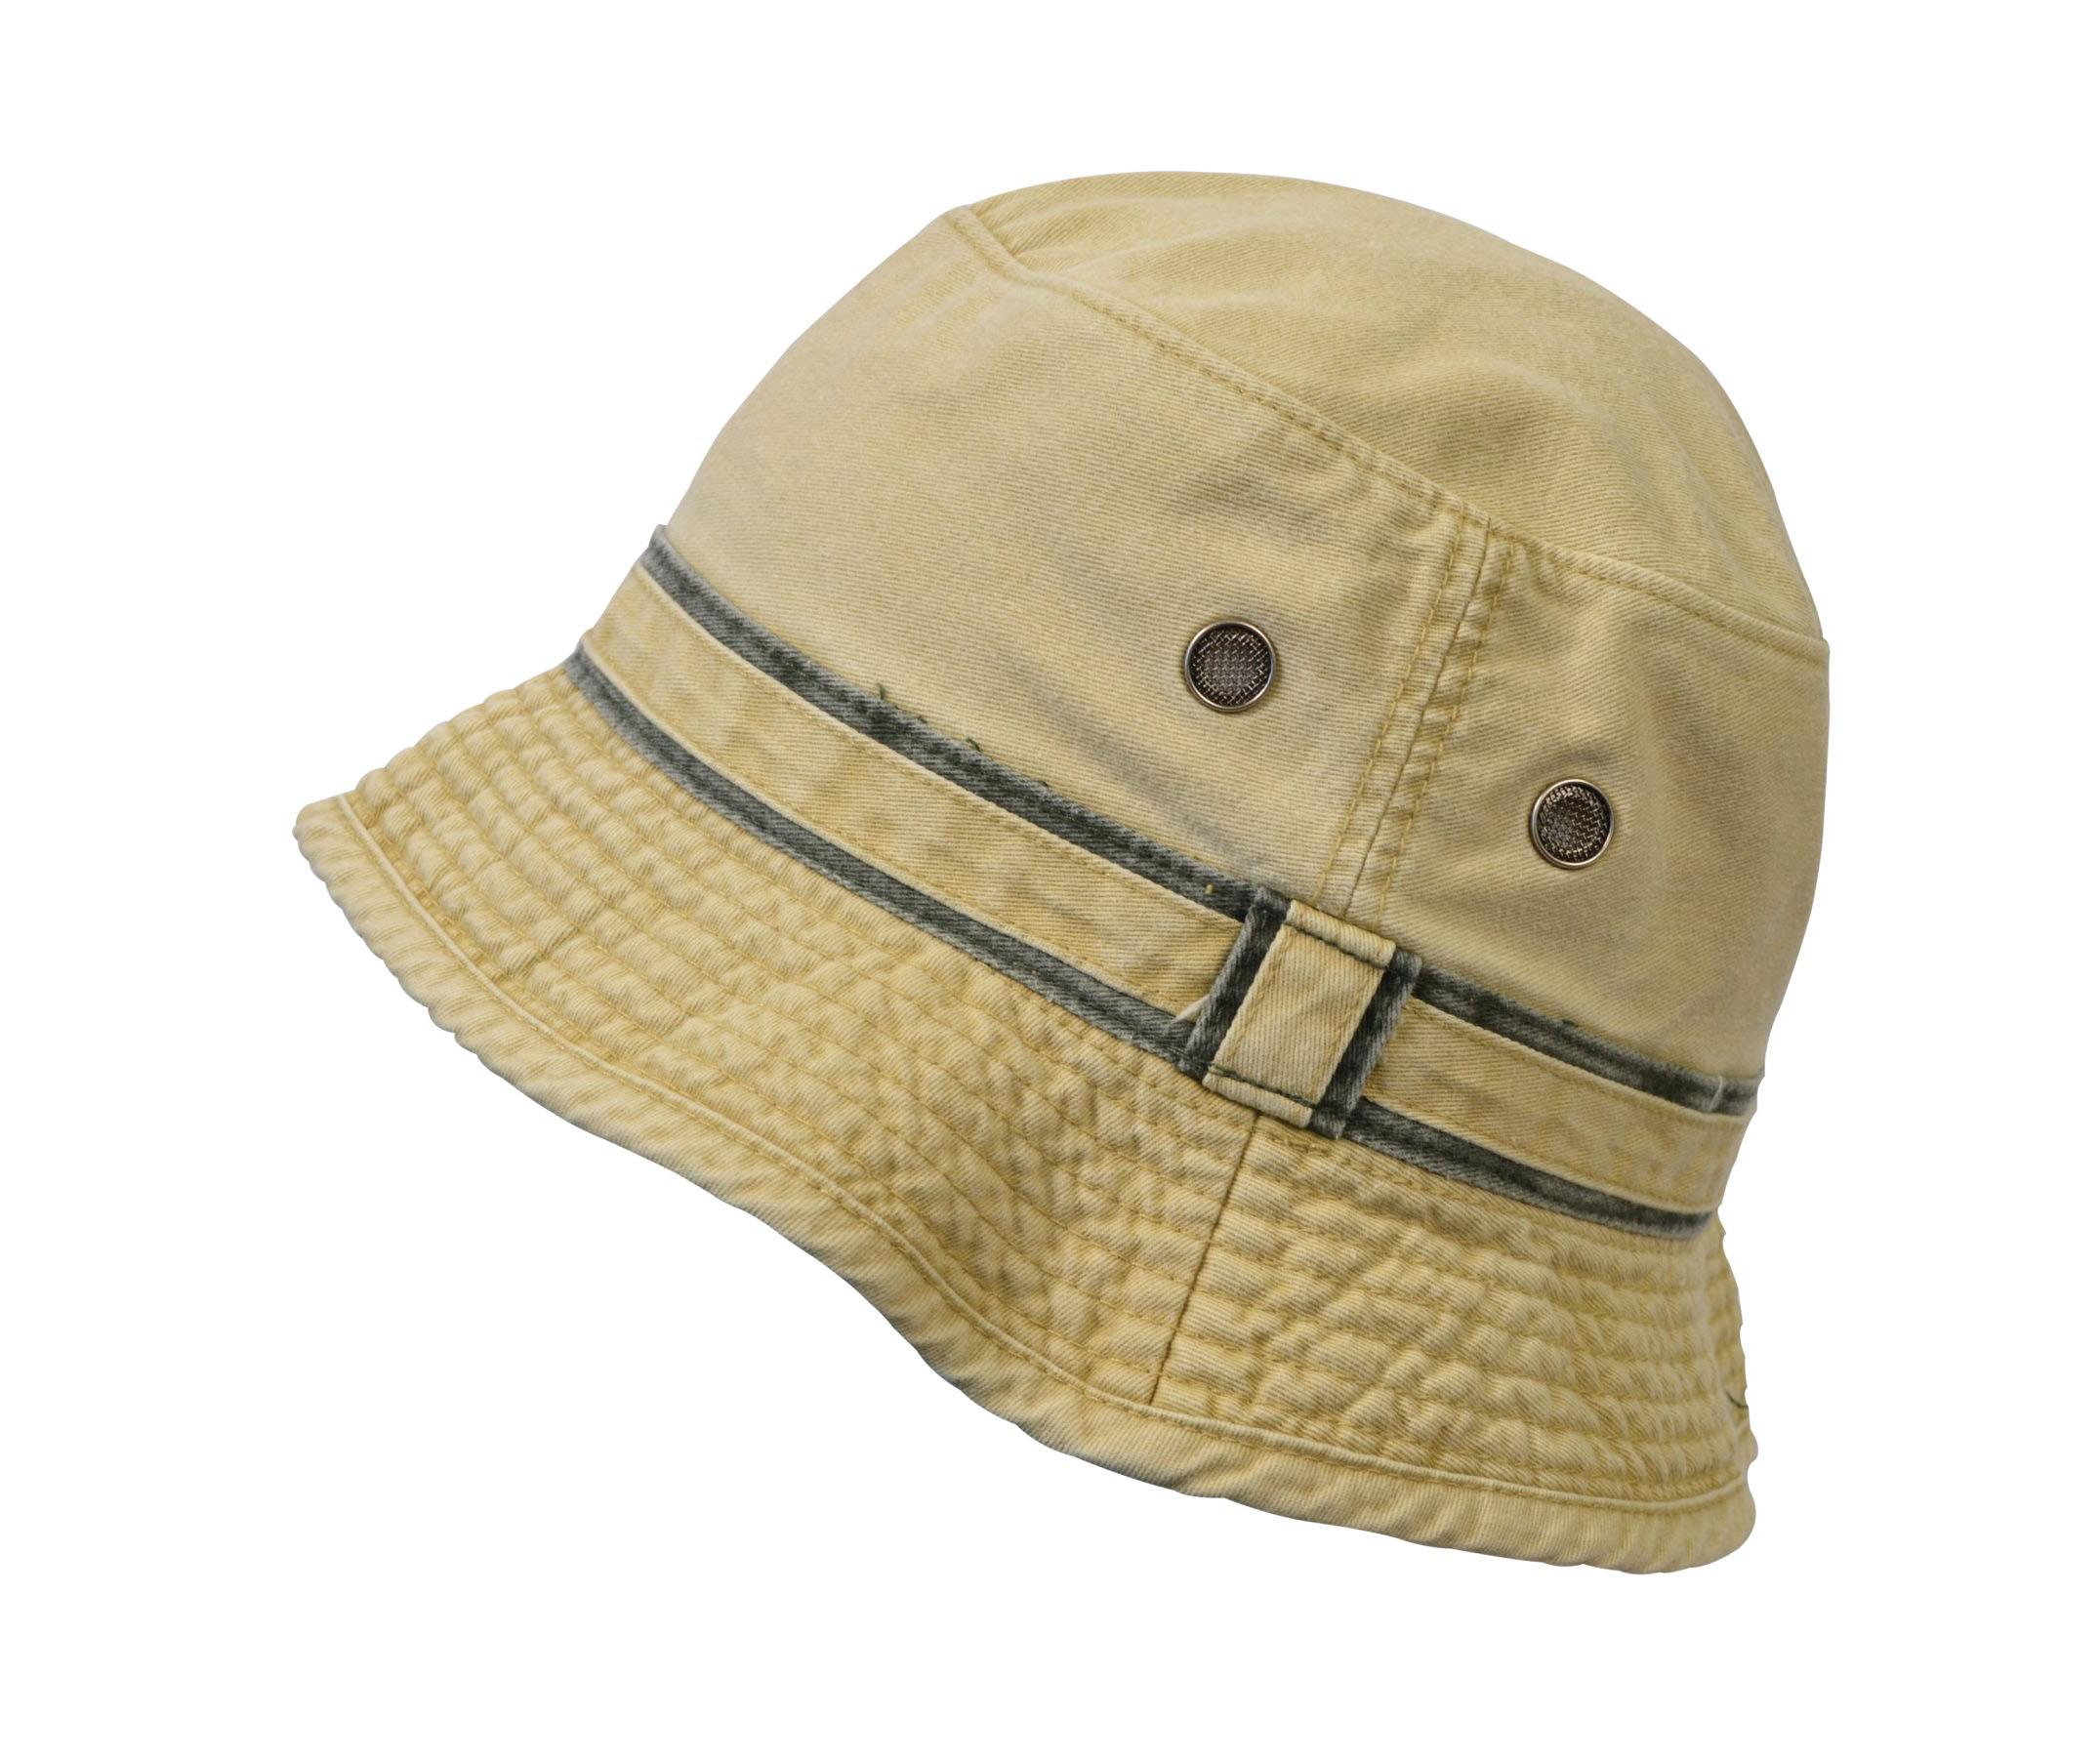 f07b28c0822e0 Unisex Boonie Hat Bucket Cap w Camo for Safari Jungle Outdoor Hiking ...